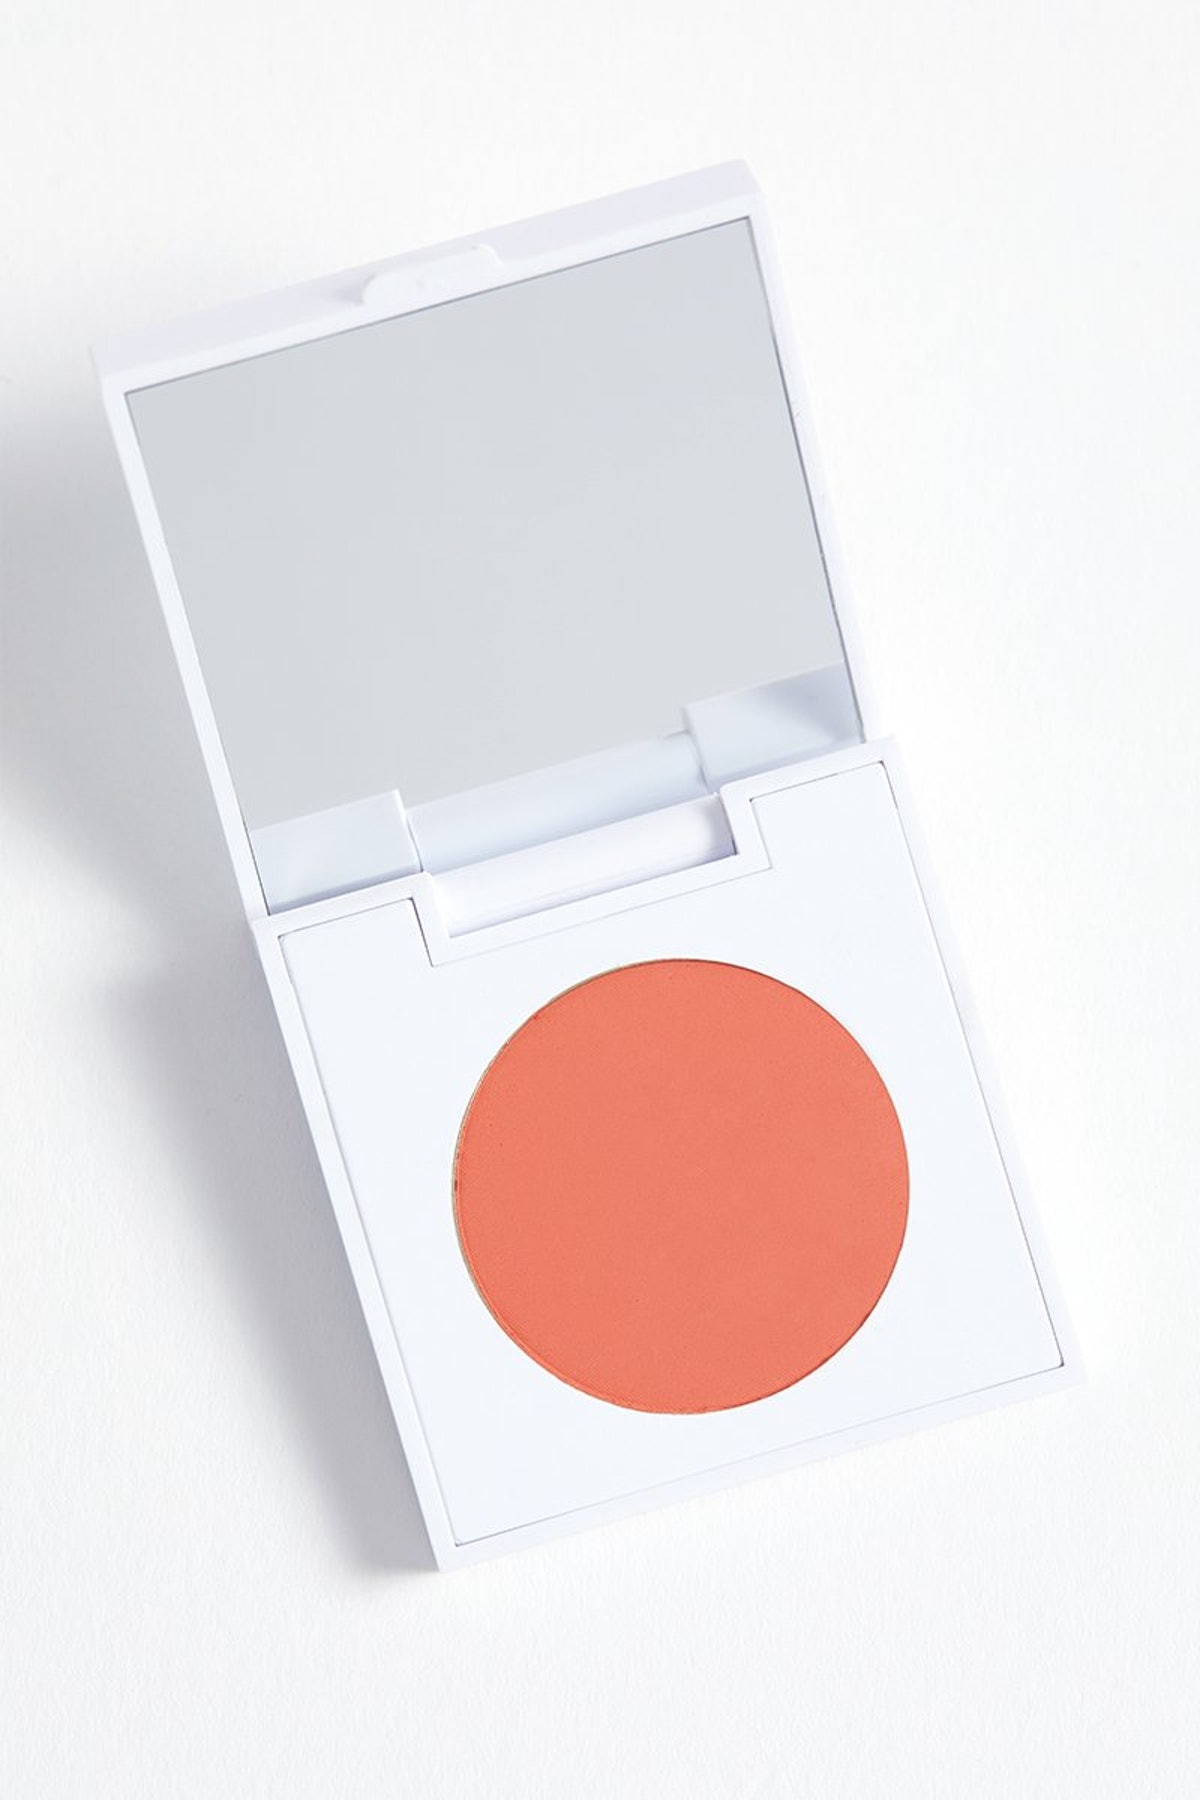 ROMCOM Pressed Powder Blush